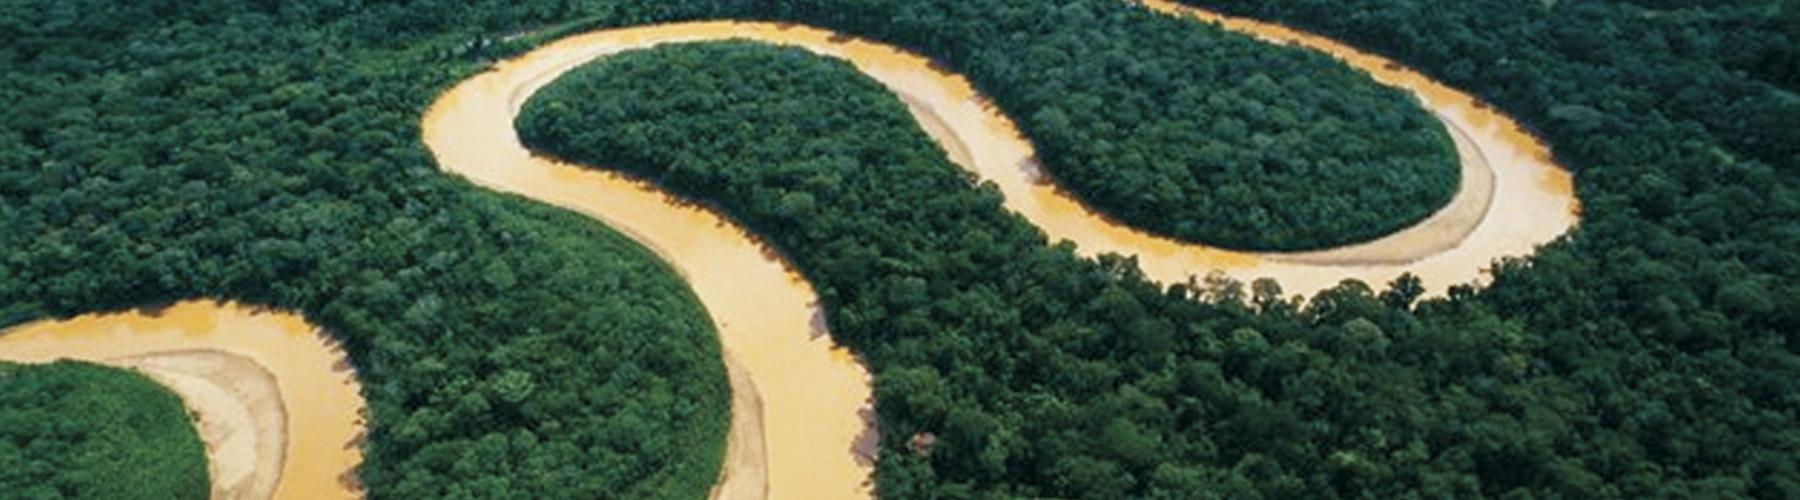 vista amazonia brasileña